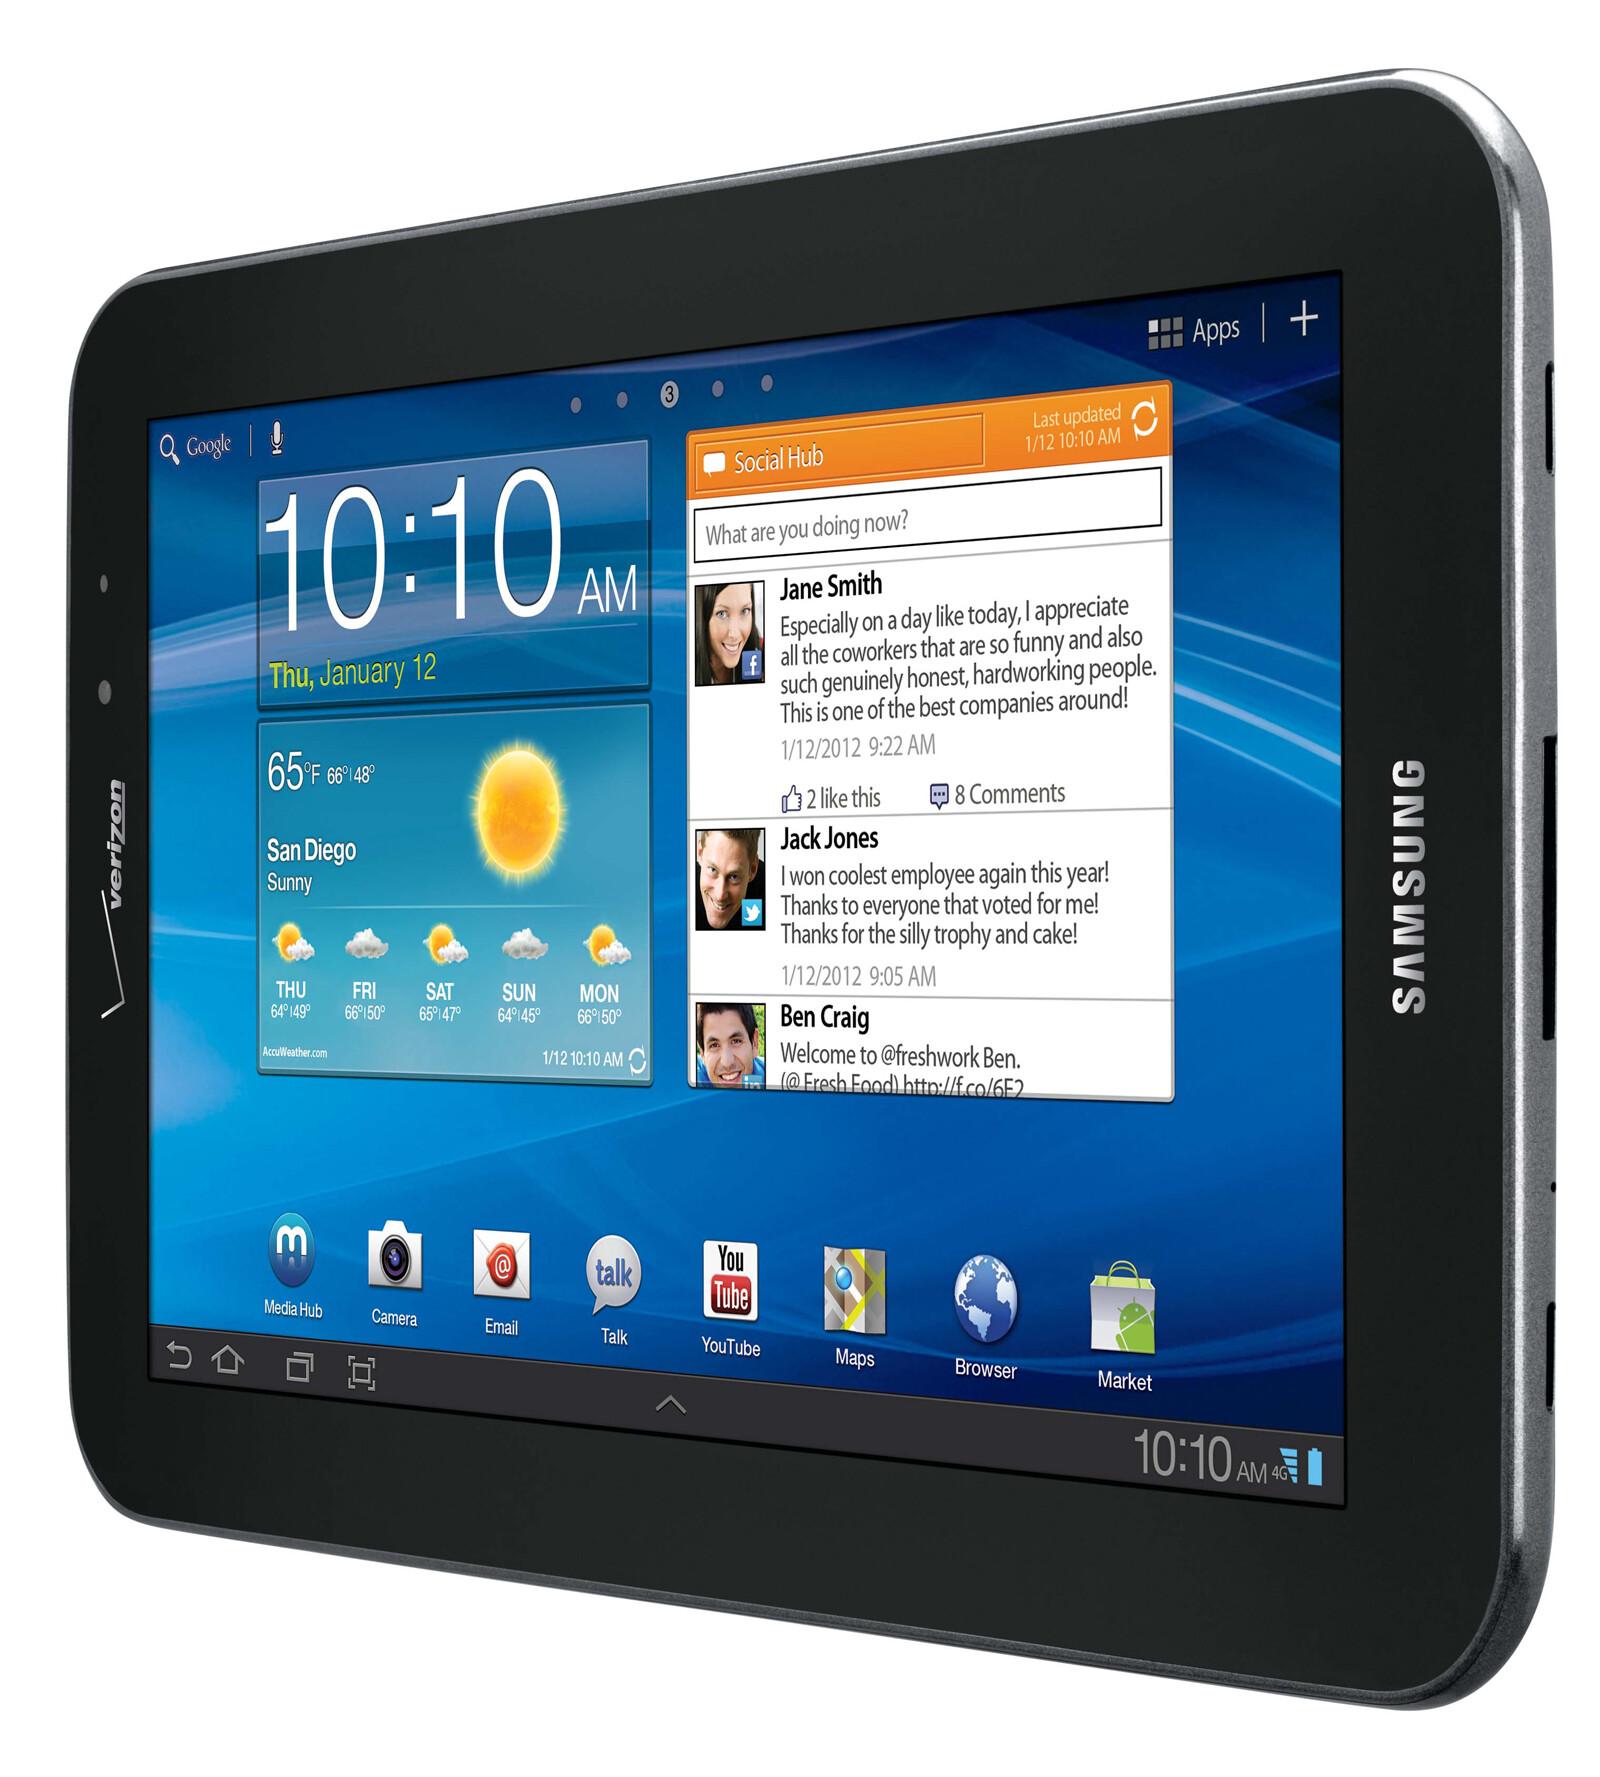 Samsung Galaxy Tab 7.7 LTE specs